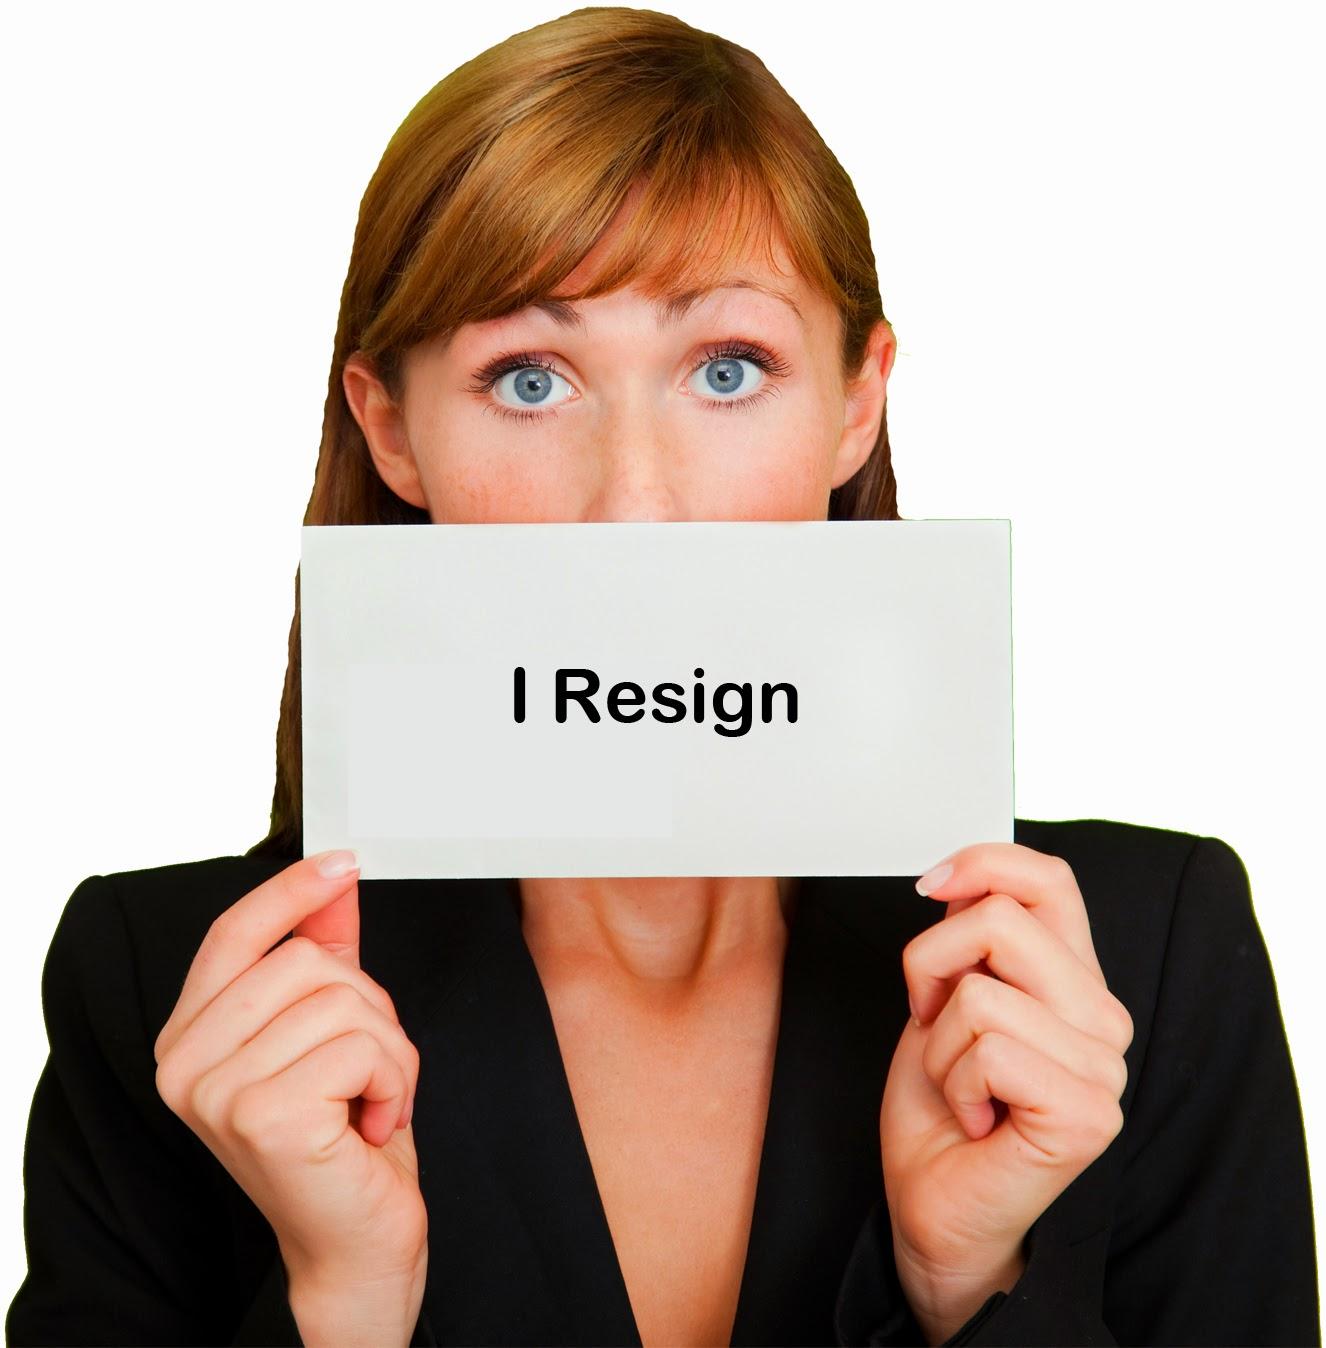 "<img src=""Image URL"" title=""Berhenti Bekerja"" alt=""resign""/>"